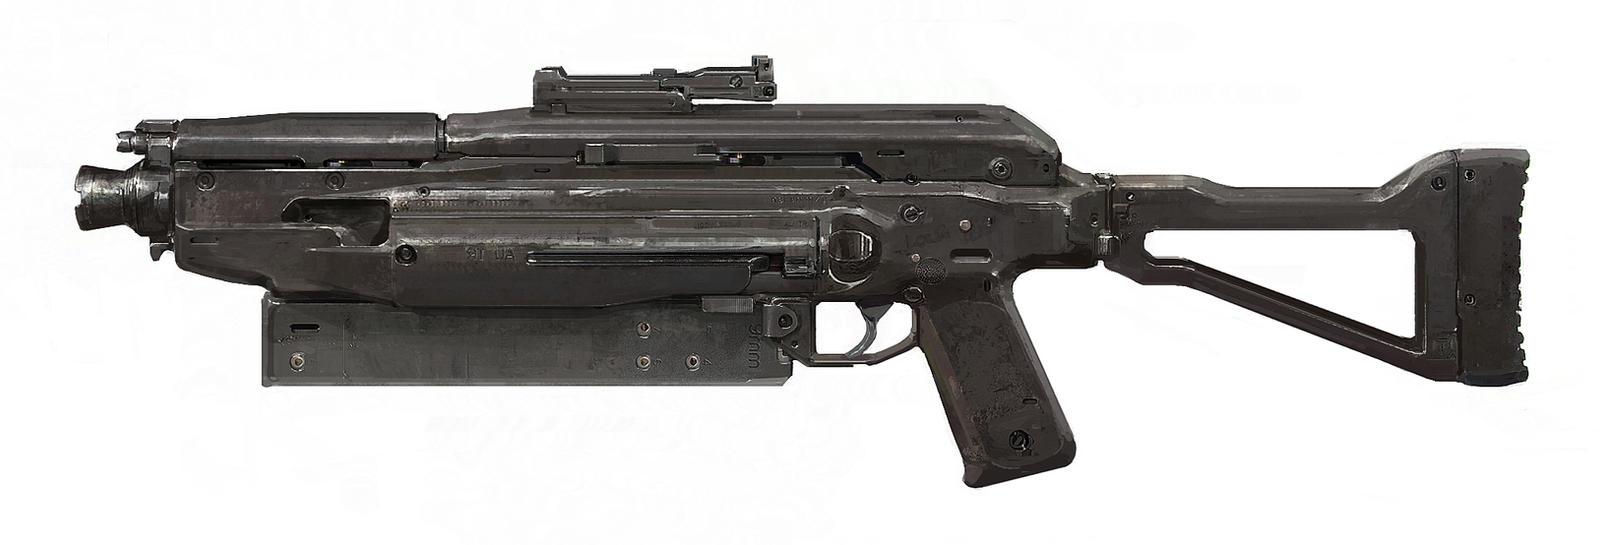 more gun by 0800